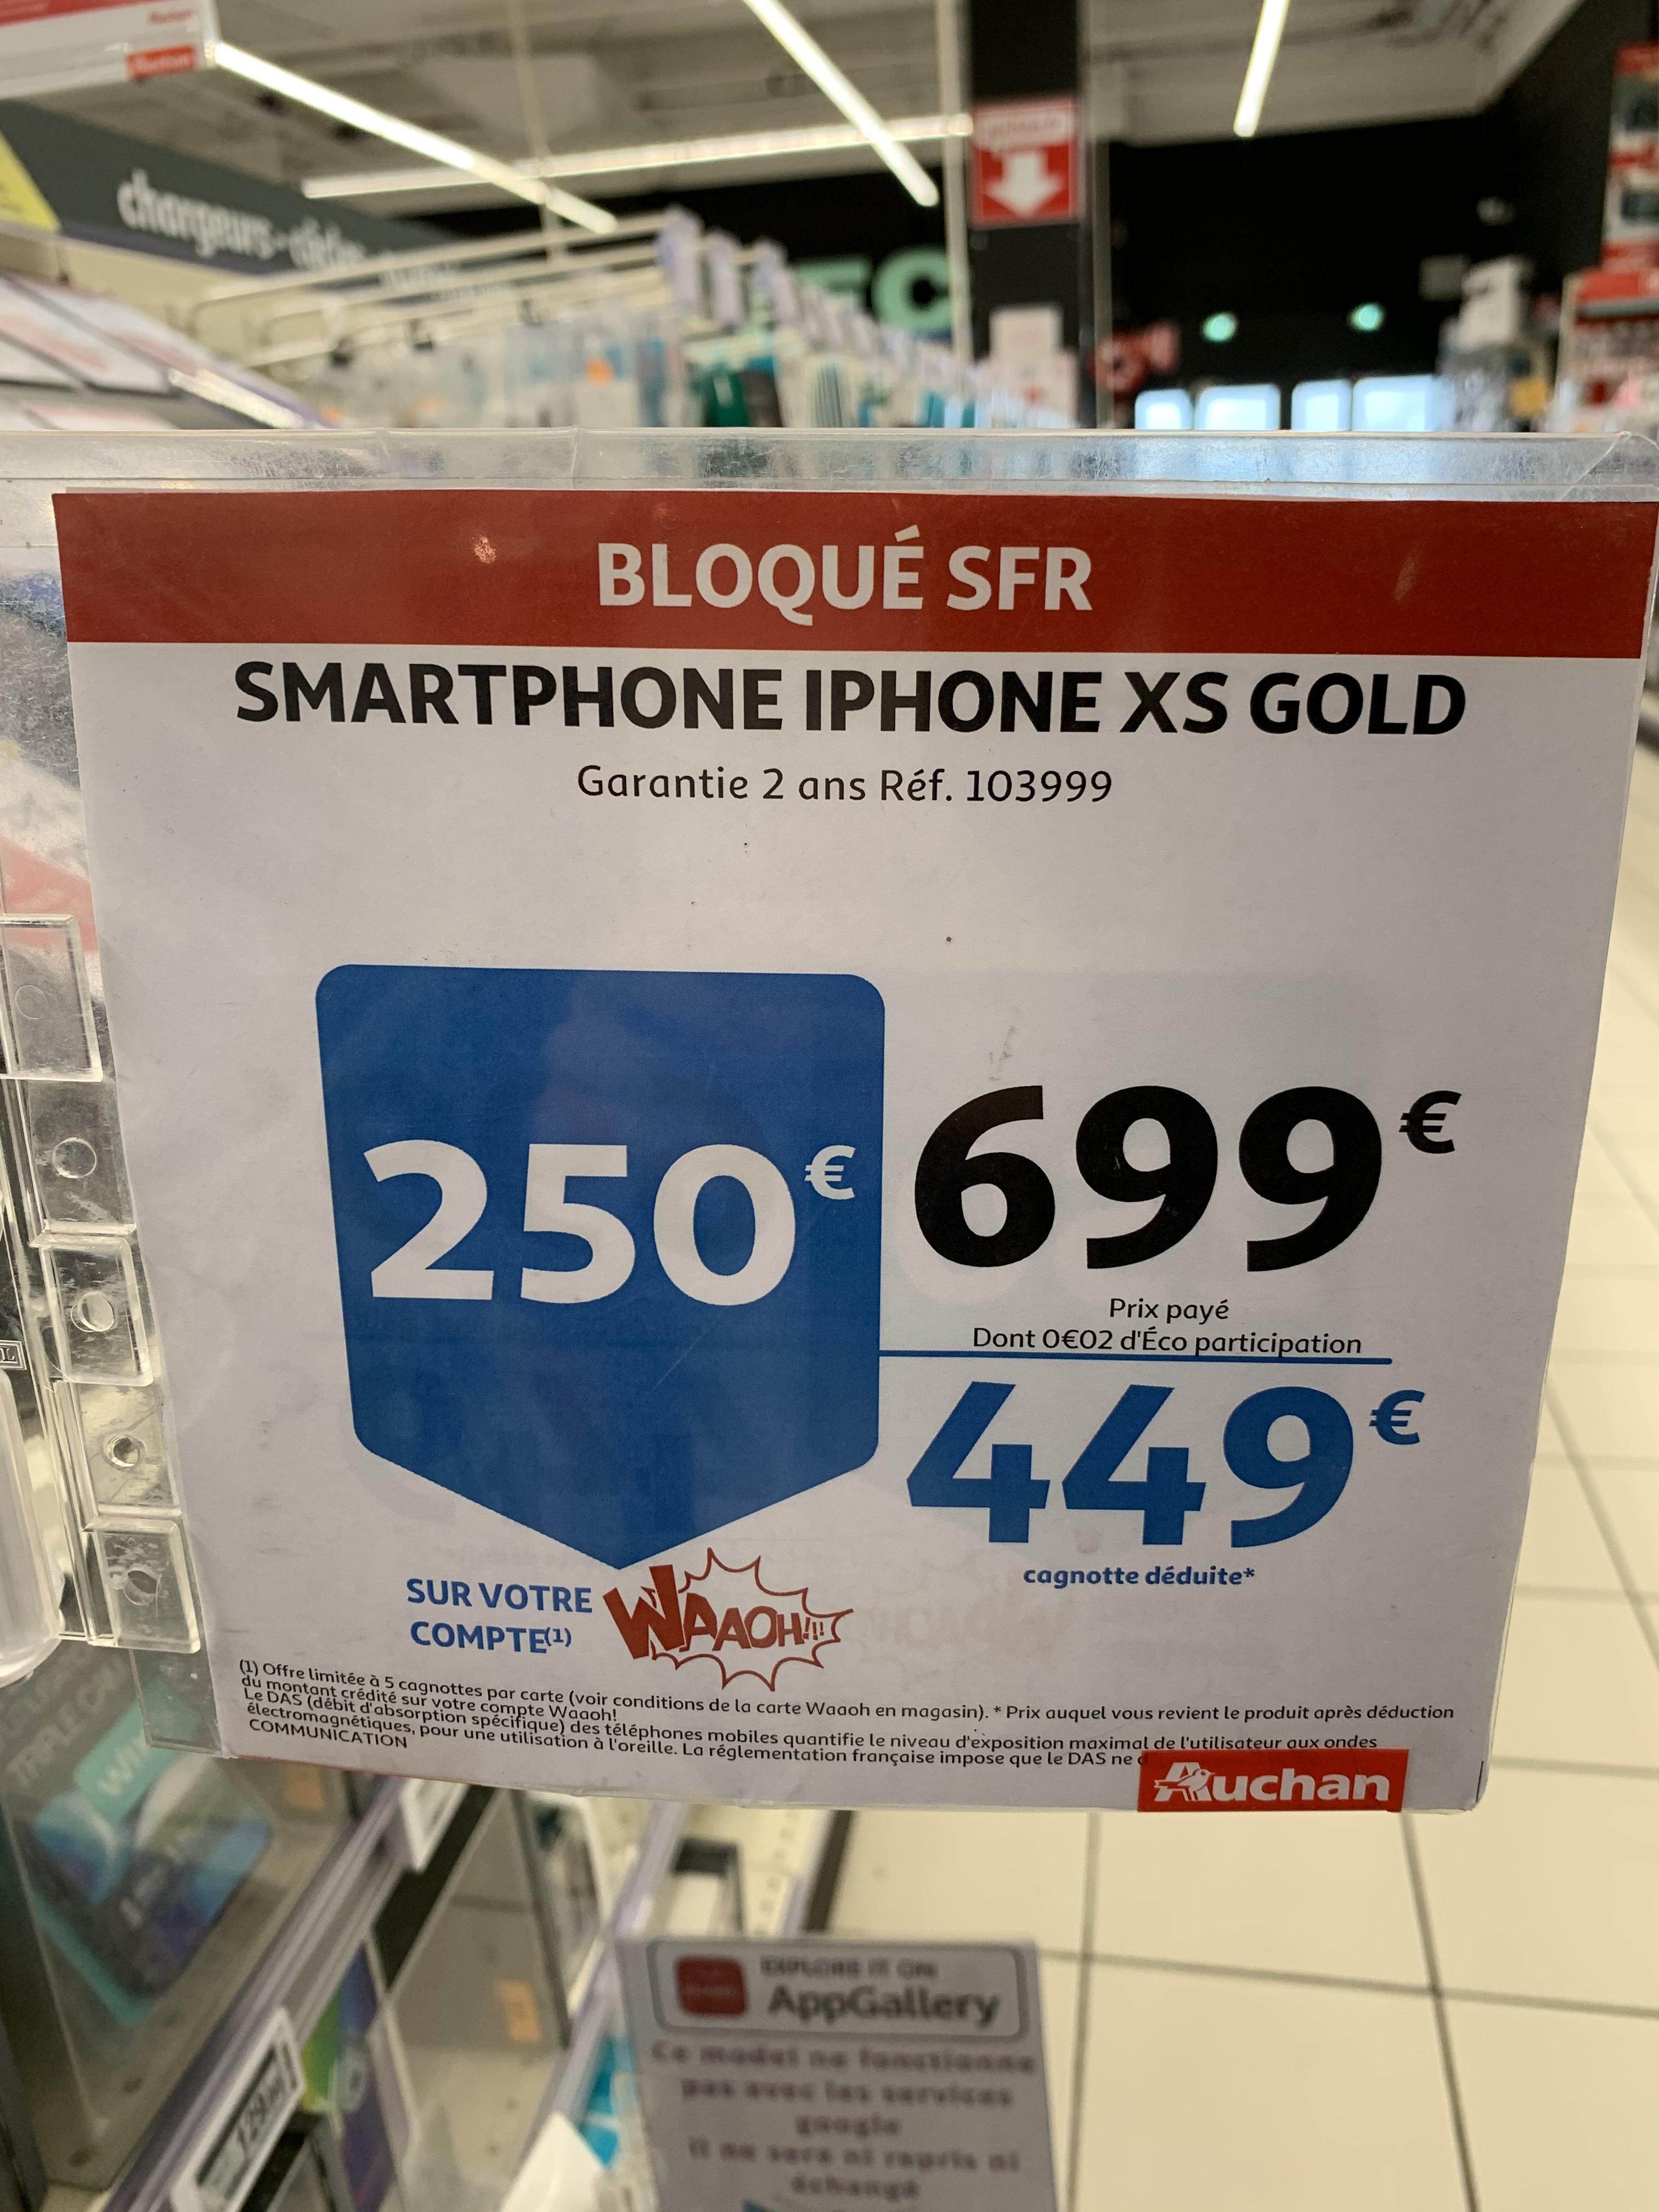 "Smartphone 5.8"" Apple iPhone Xs - full HD+, A12, 4 Go de RAM, 64 Go, gold, bloqué SFR (via 250€ sur la carte de fidélité) - Montauban (82)"